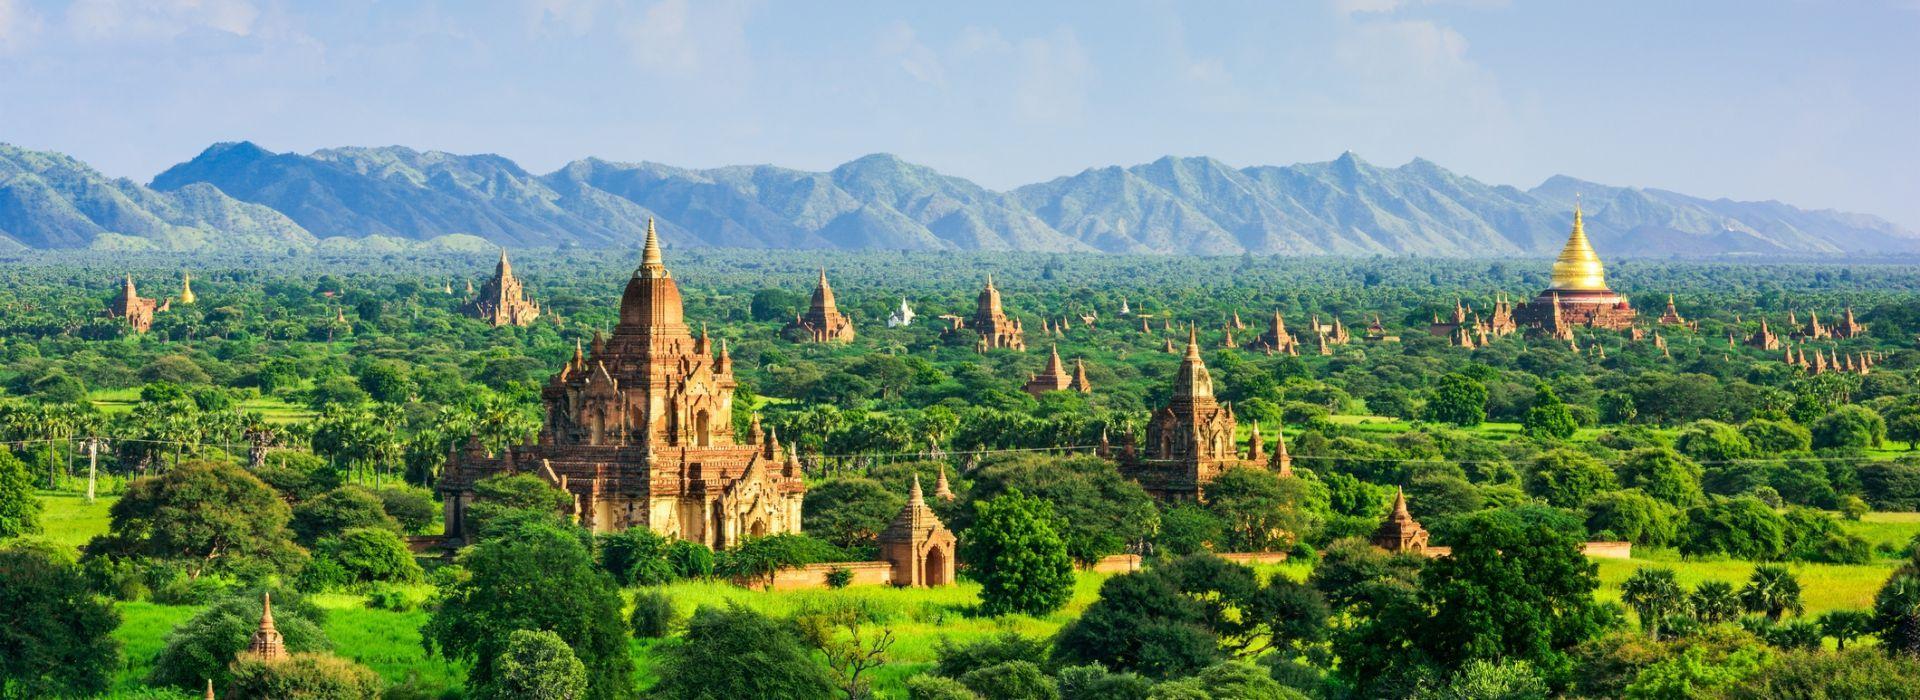 Kayaking and canoeing Tours in Myanmar